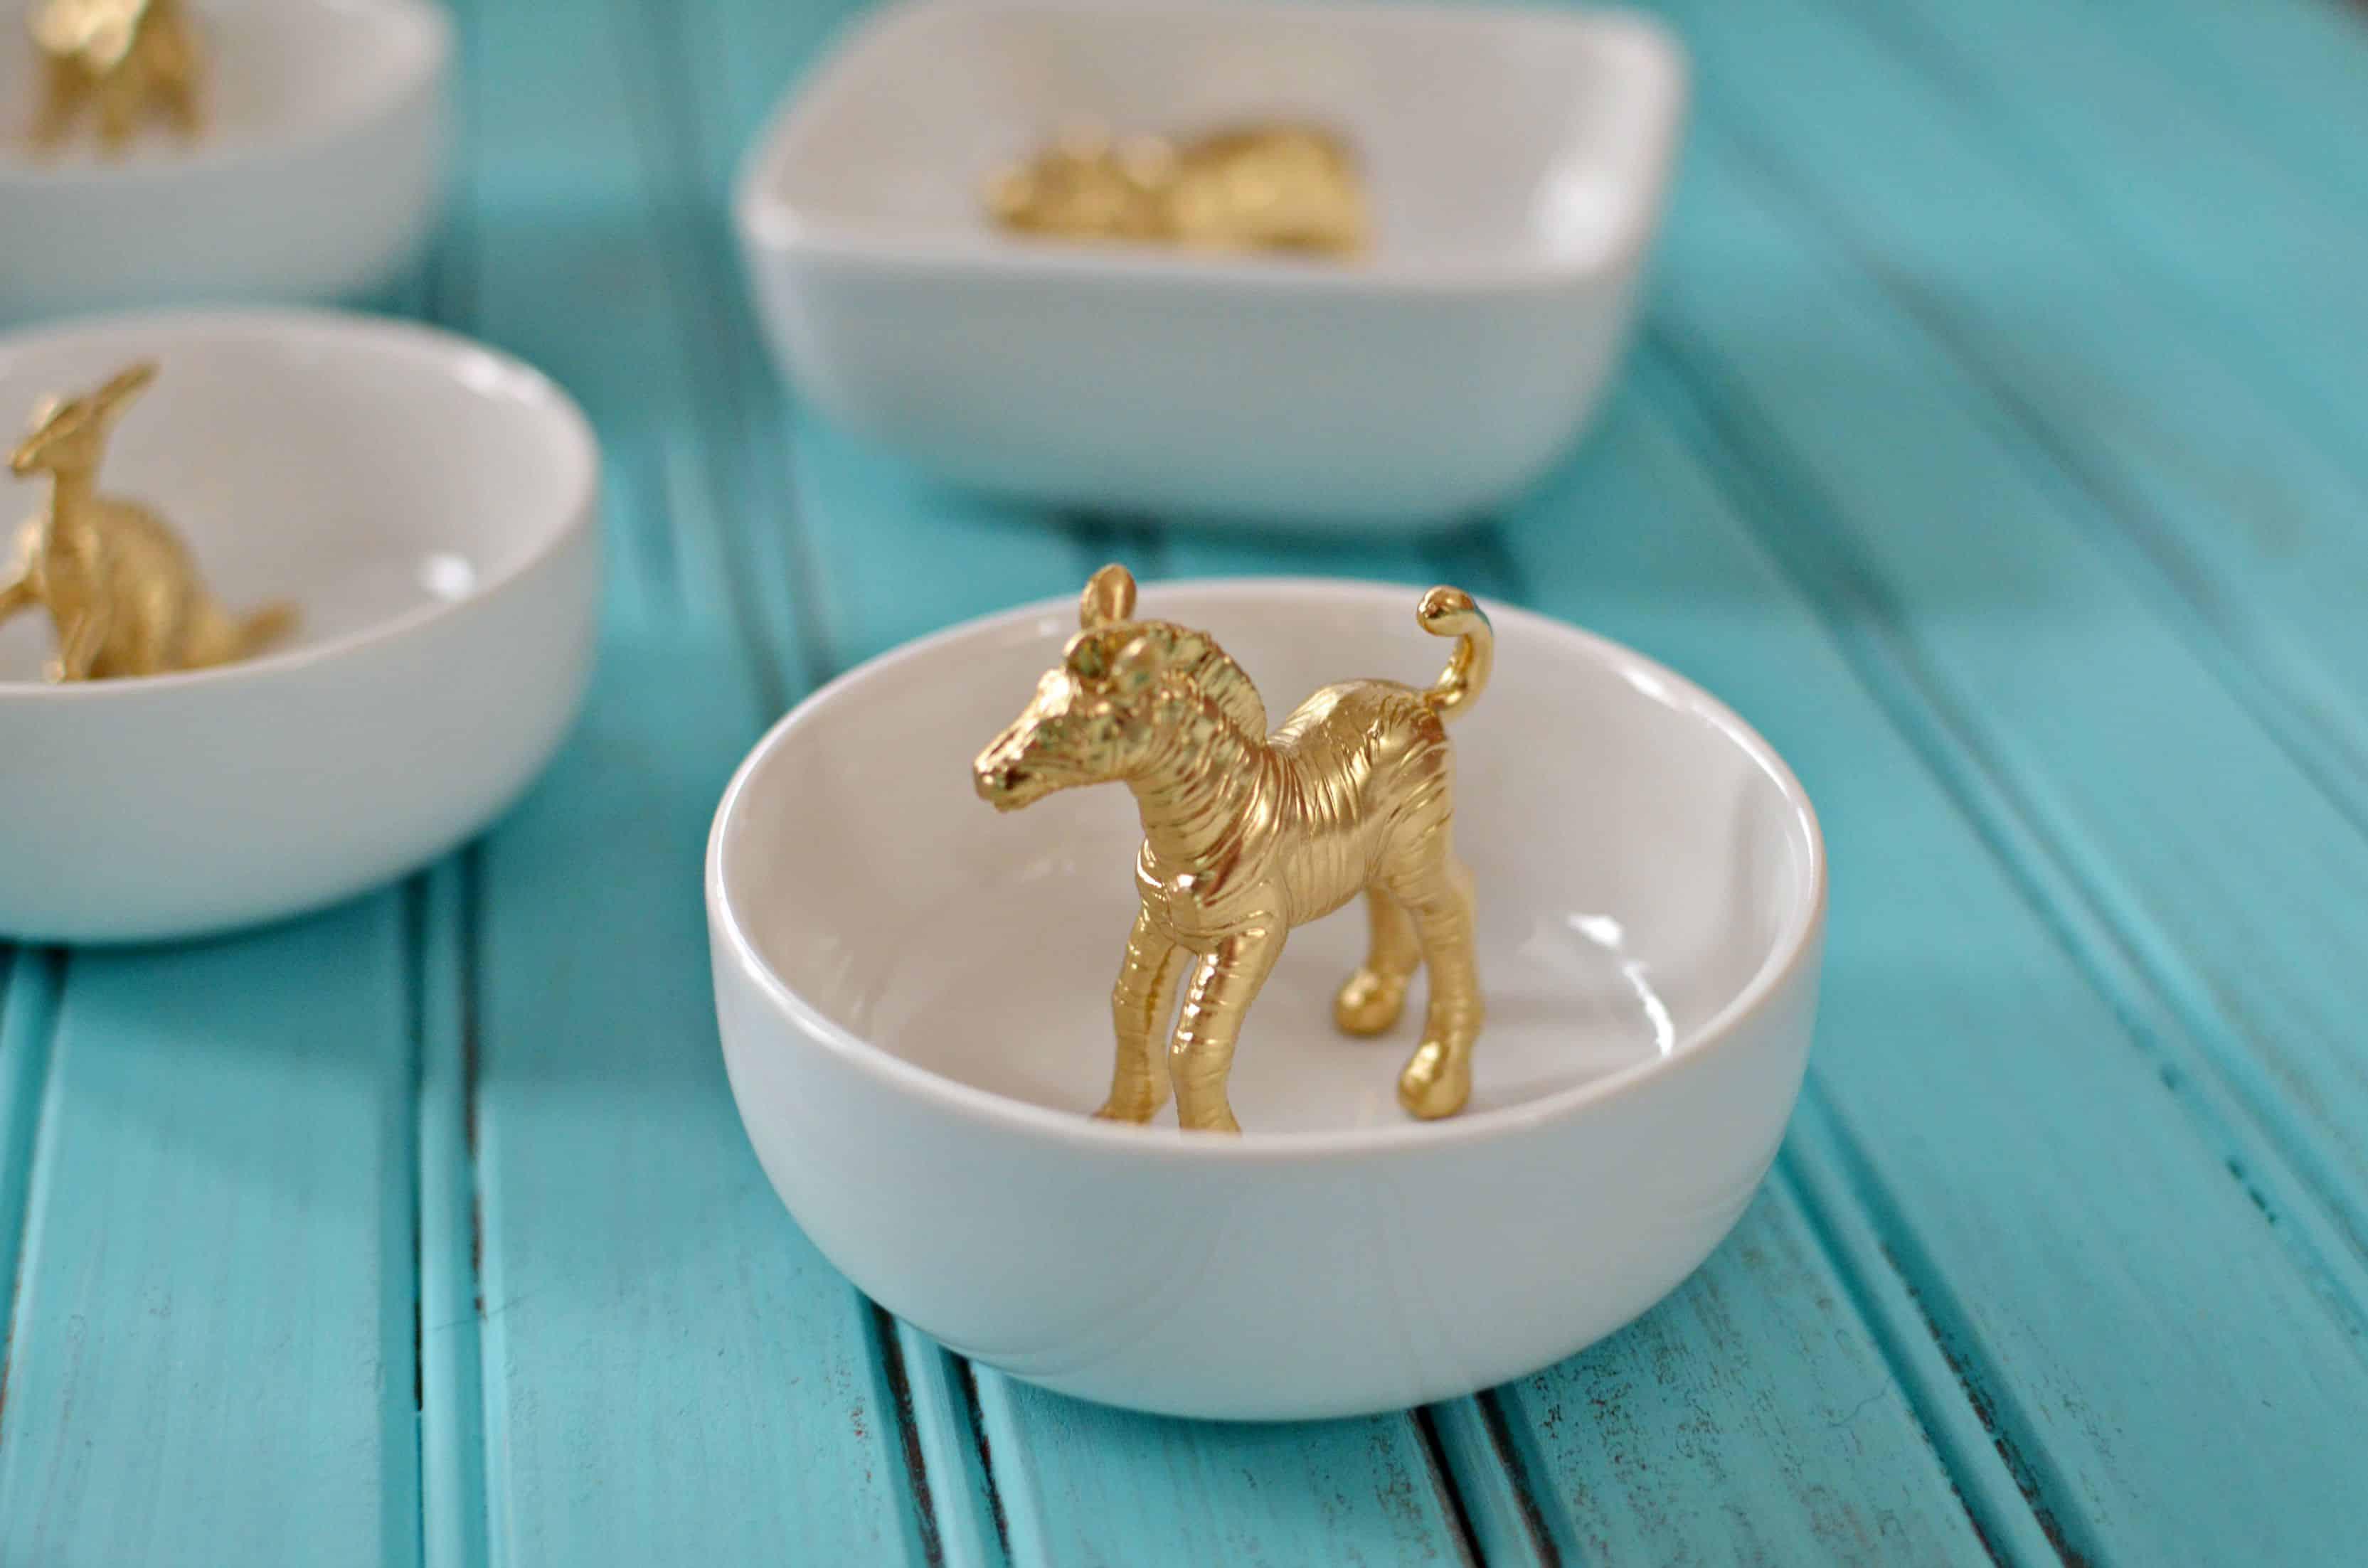 Gold animal trinket dish